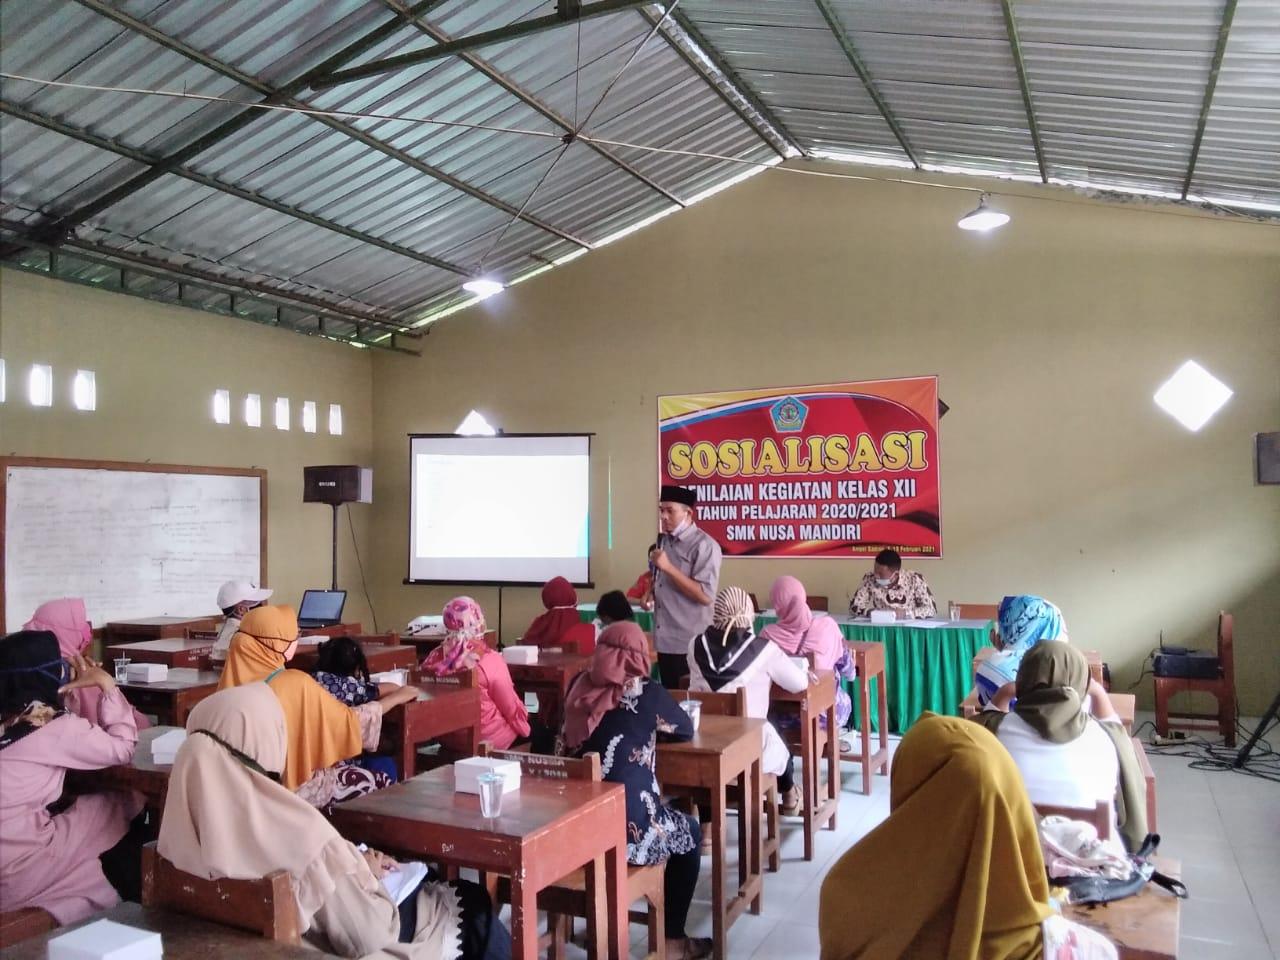 Sosialisasi Ujian Sekolah dan Ujian Kompetensi Keahlian SMK Nusa Mandiri